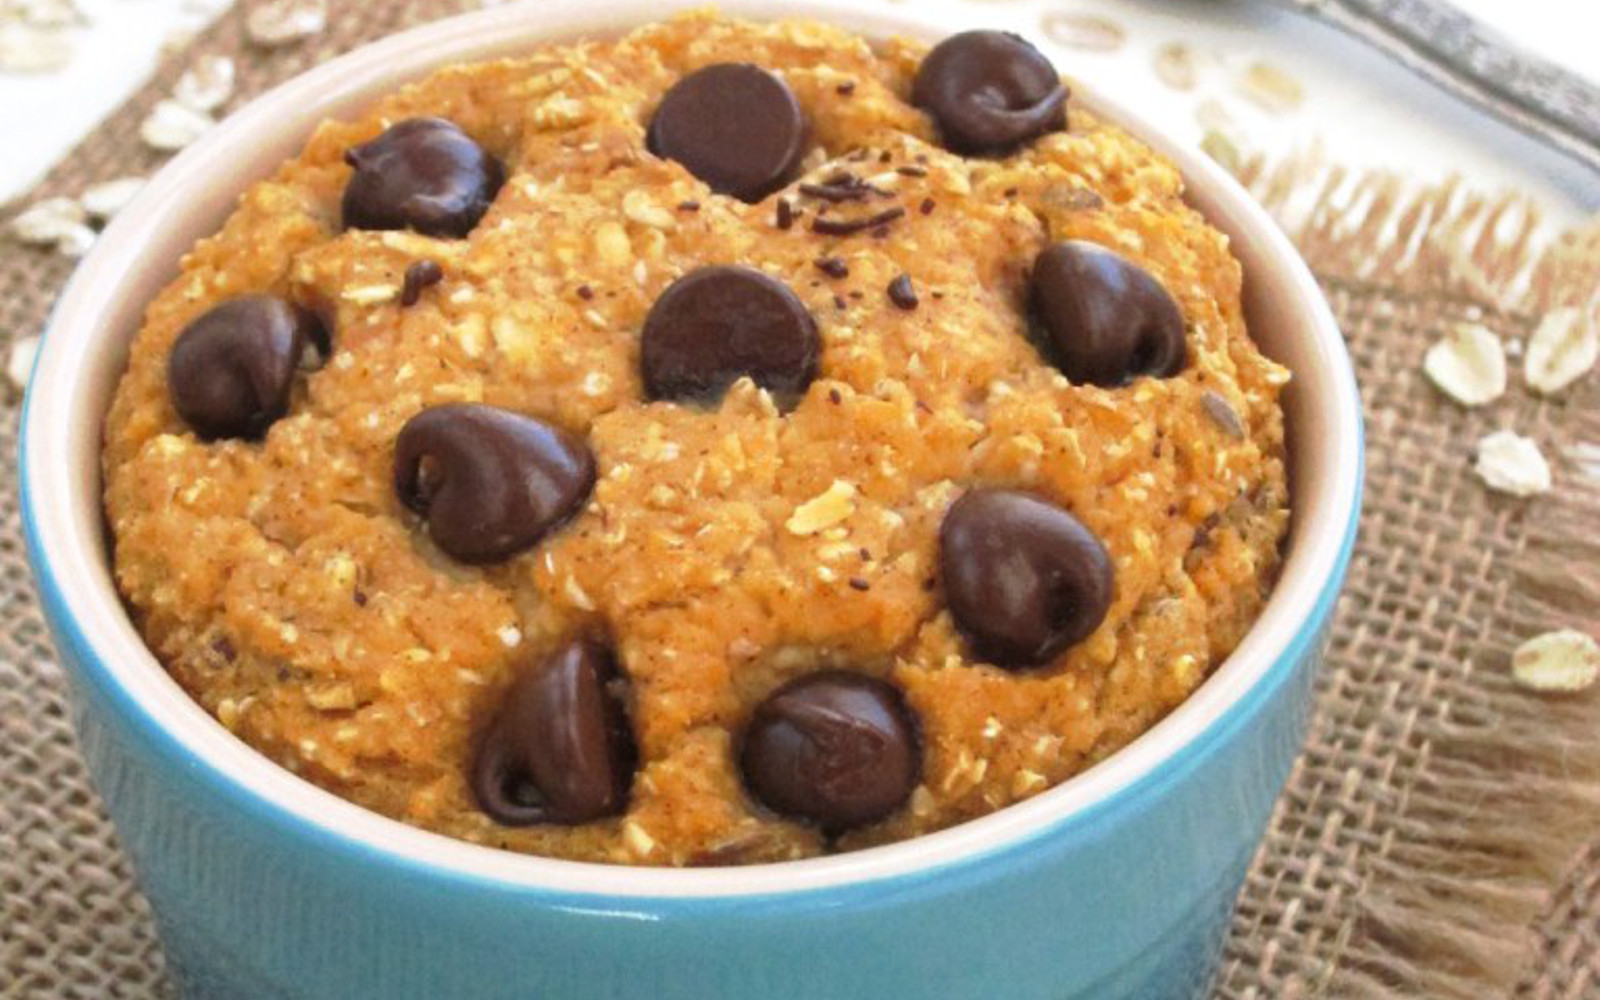 Vegan Gluten-Free Sweet Potato Chocolate Chip Baked Oatmeal